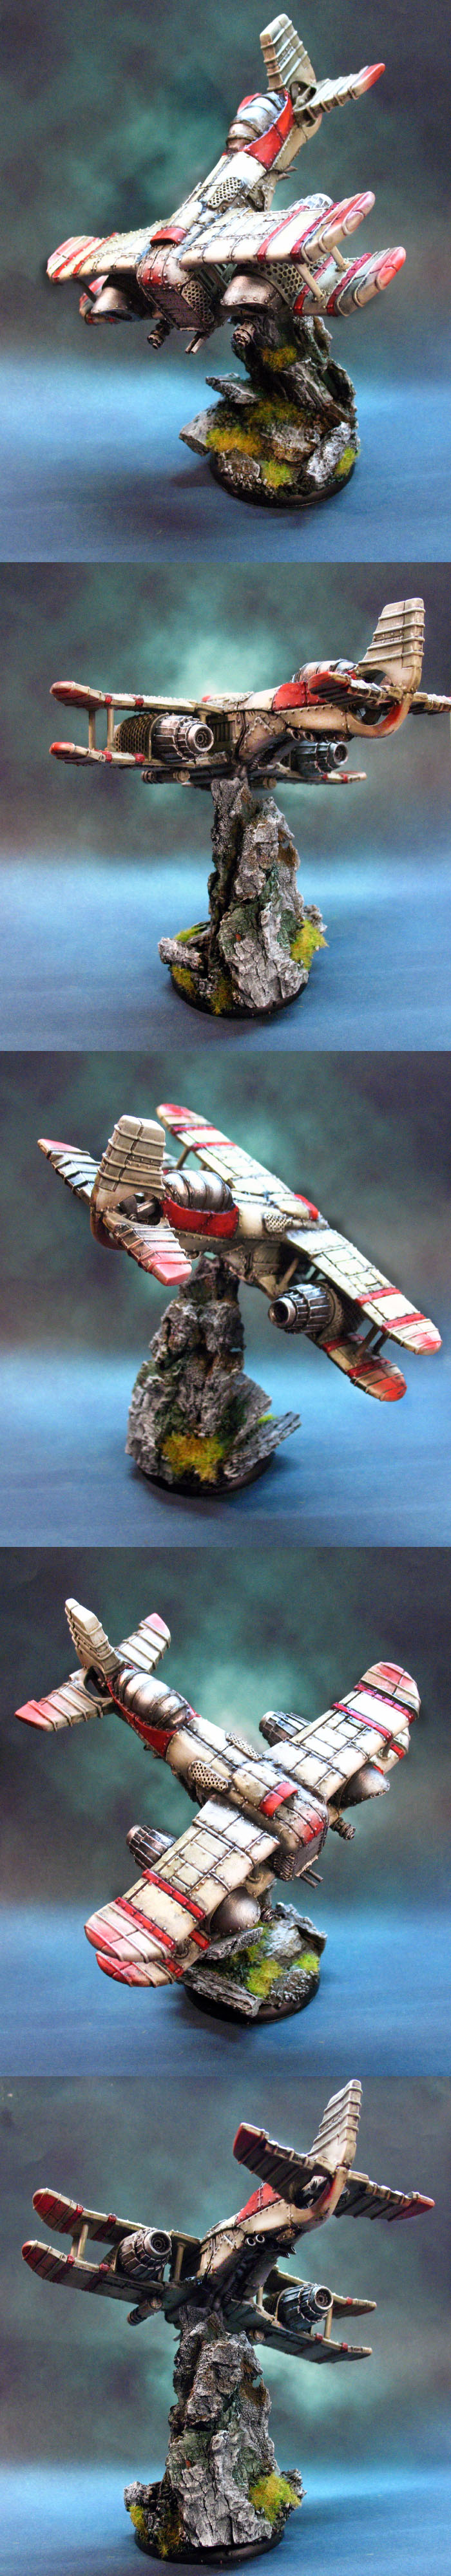 Warzone Ressurection Emancipator Combat Aircraft